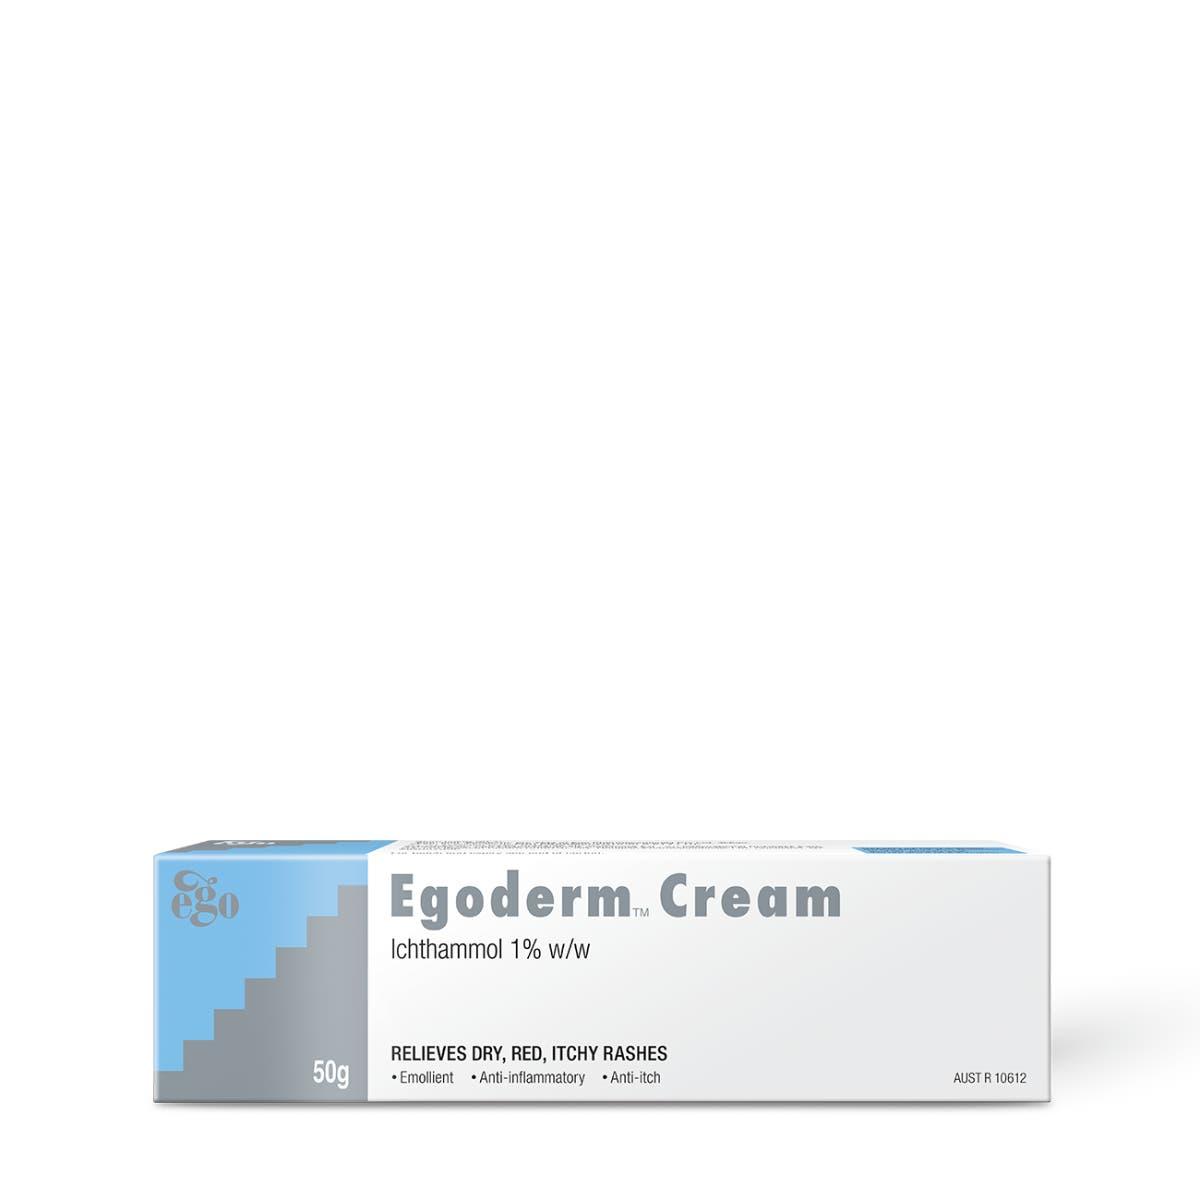 Egoderm Cream 50g